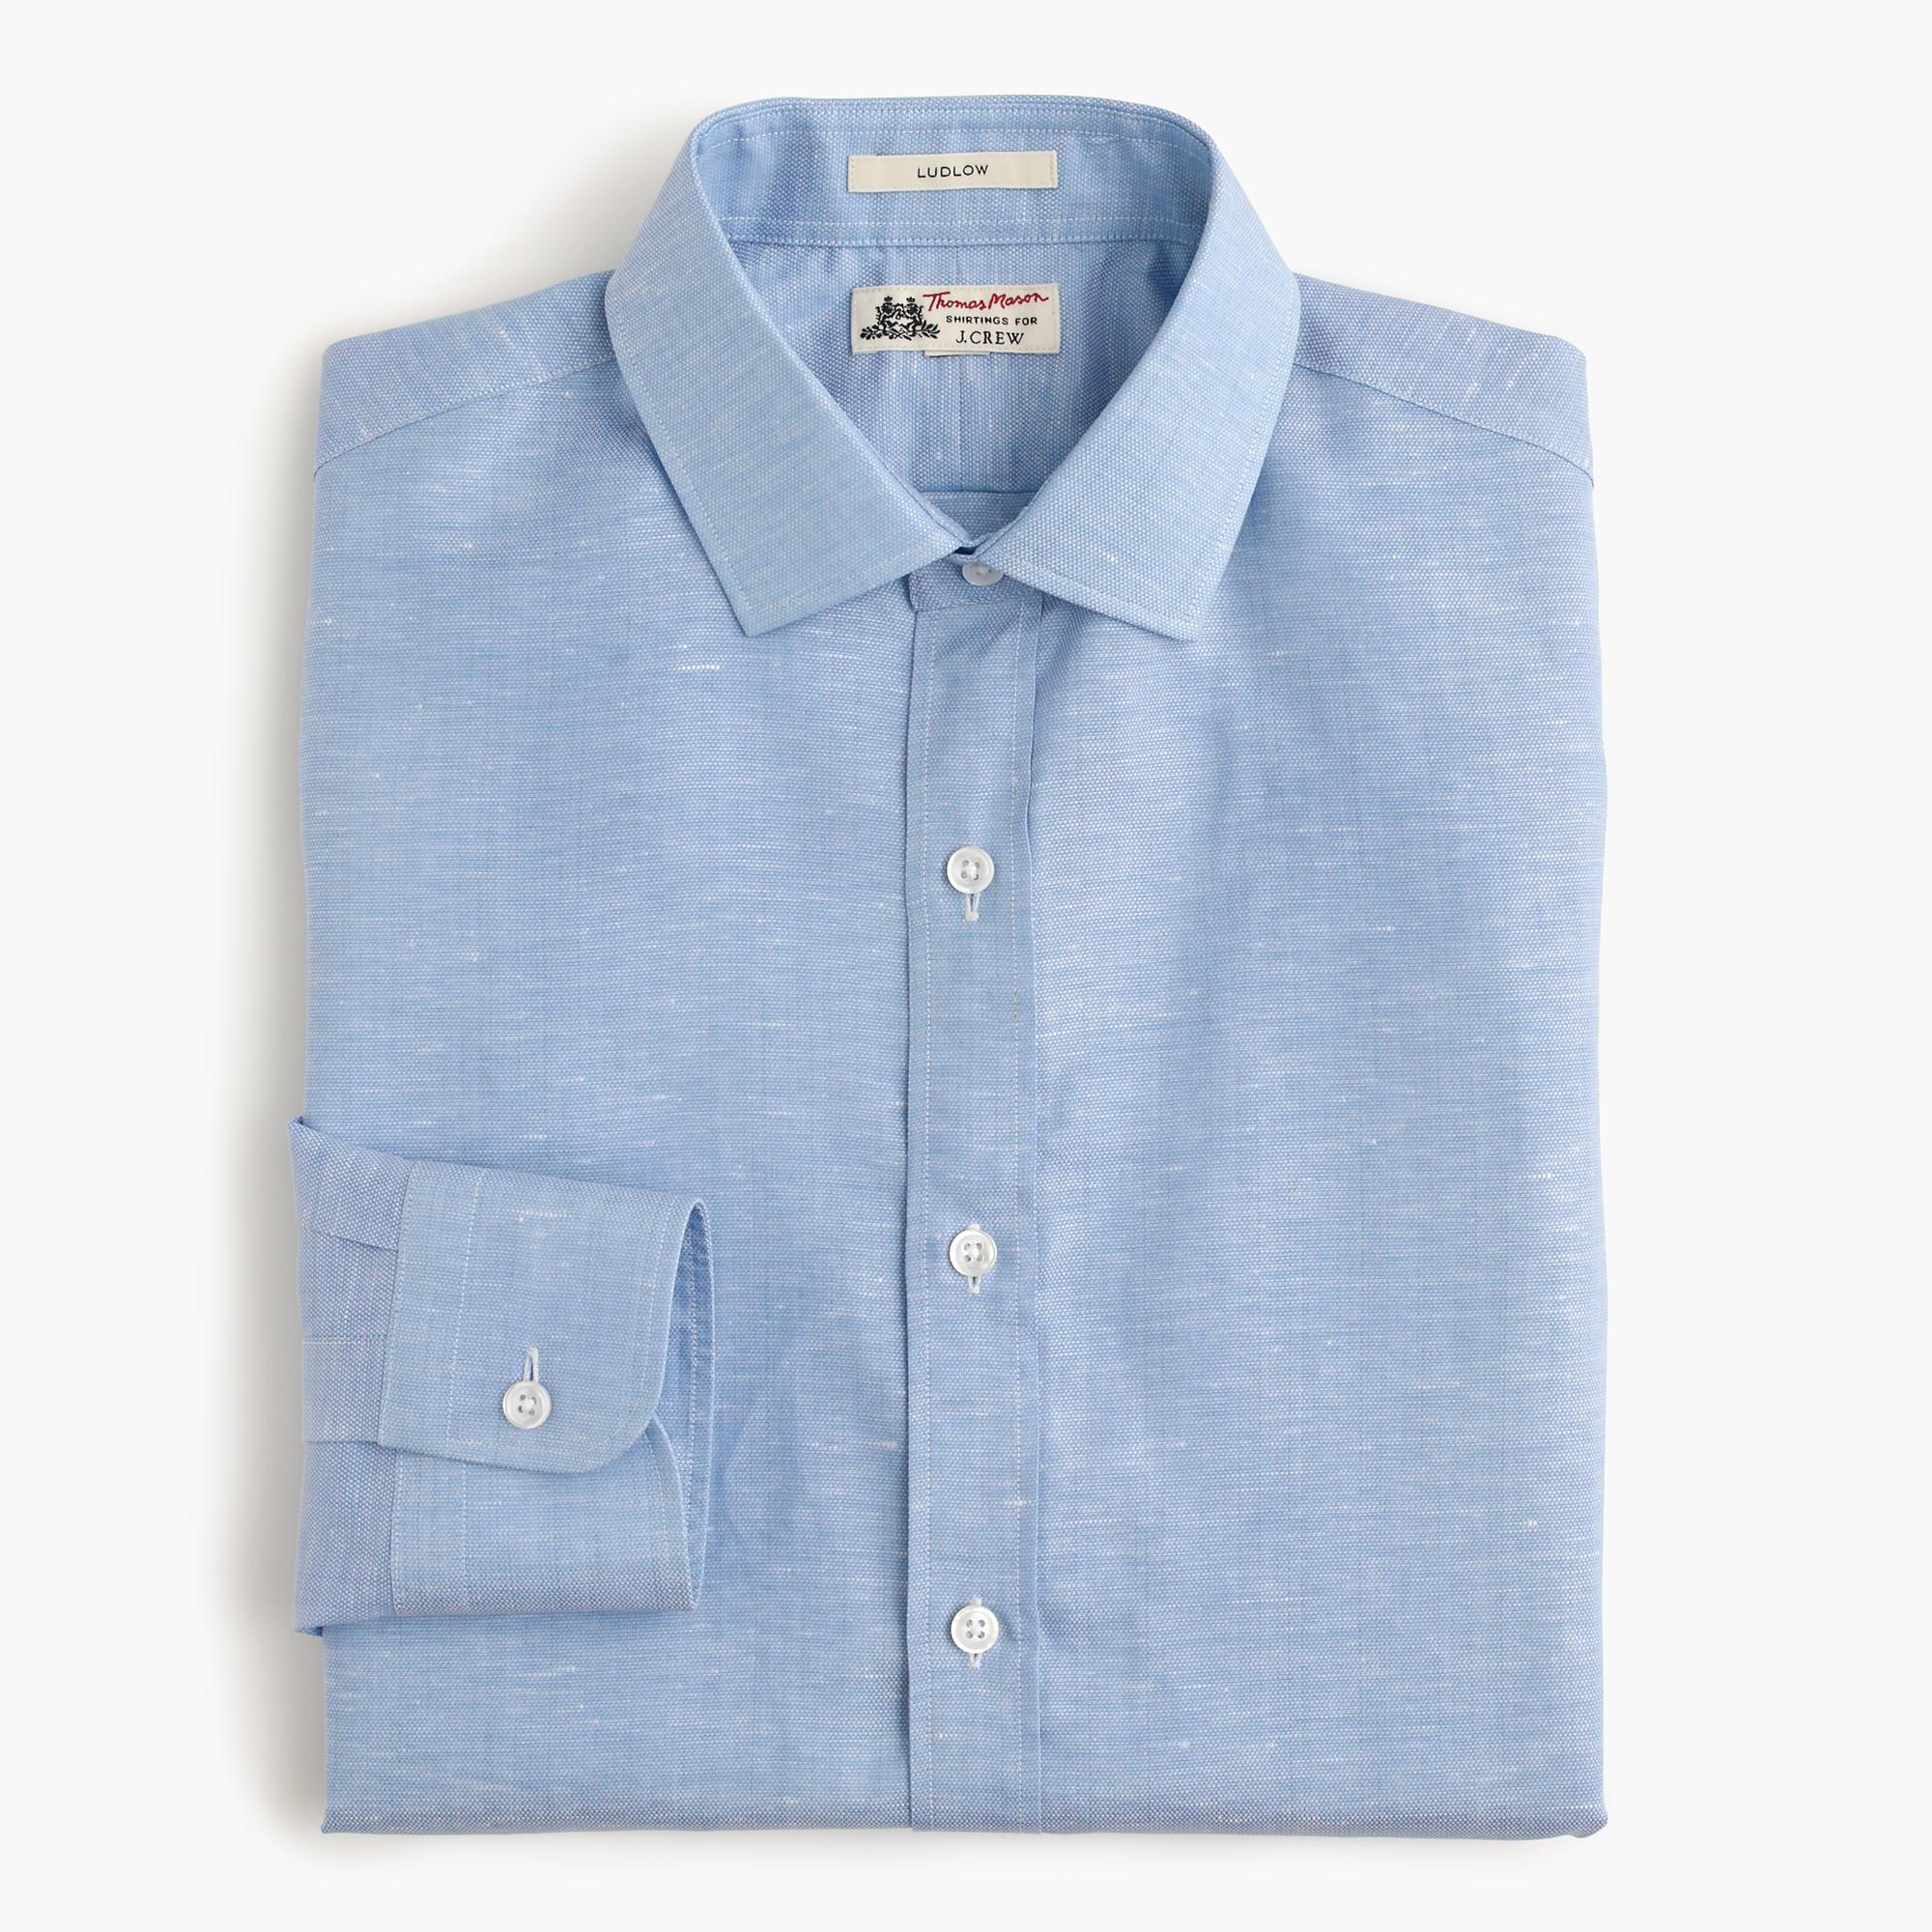 Thomas mason for j crew ludlow shirt in italian cotton for Mason s men s shirts